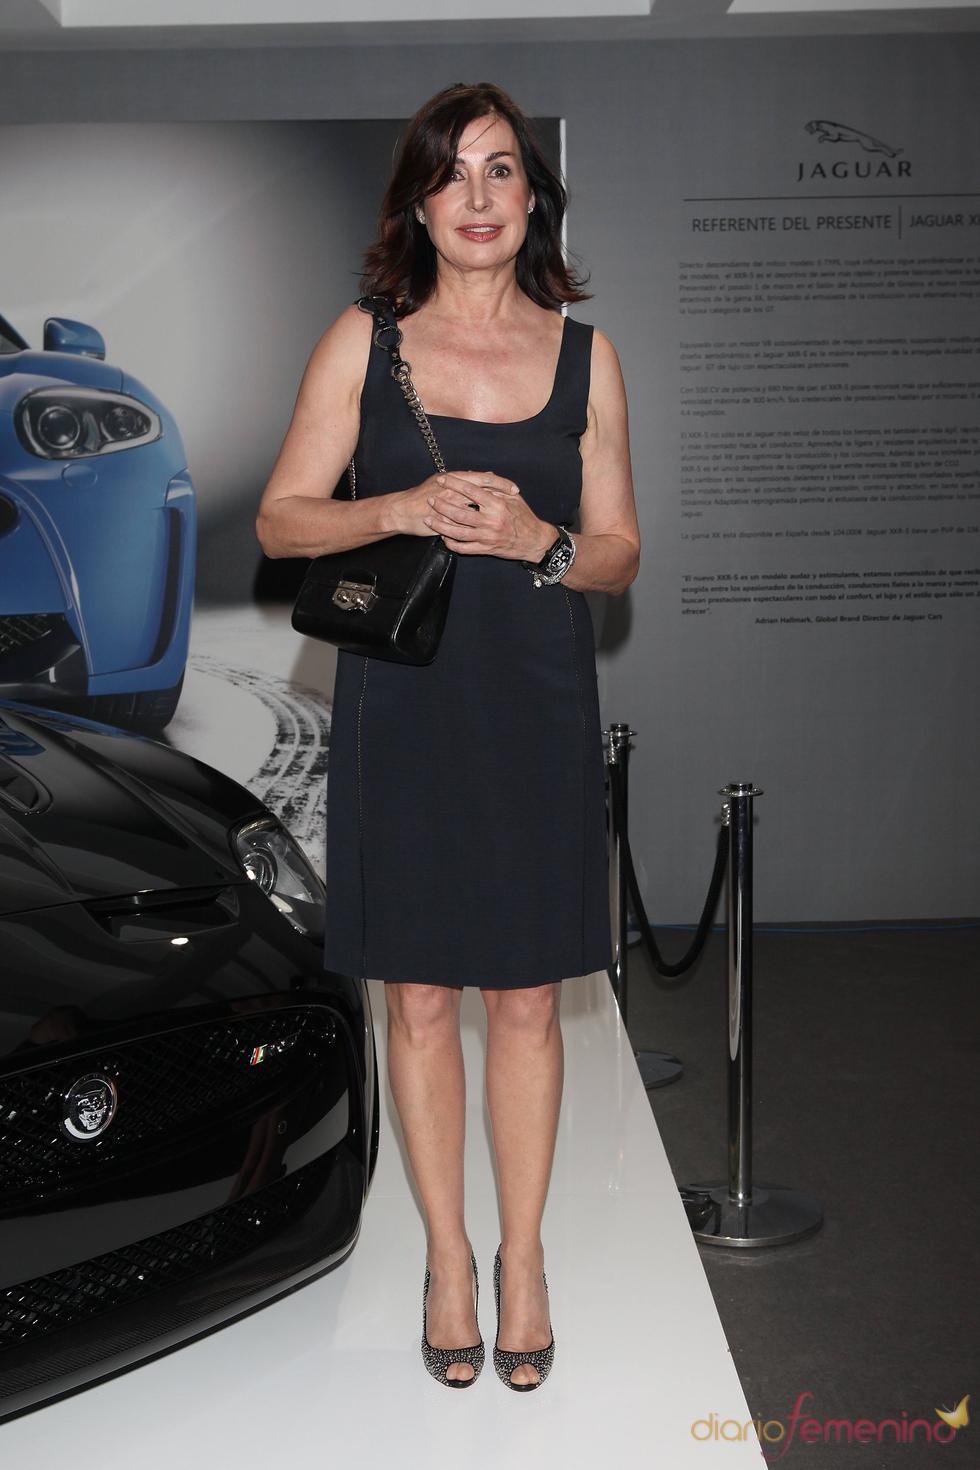 Carmen Martínez Bordiú en un acto promocional de la firma Jaguar